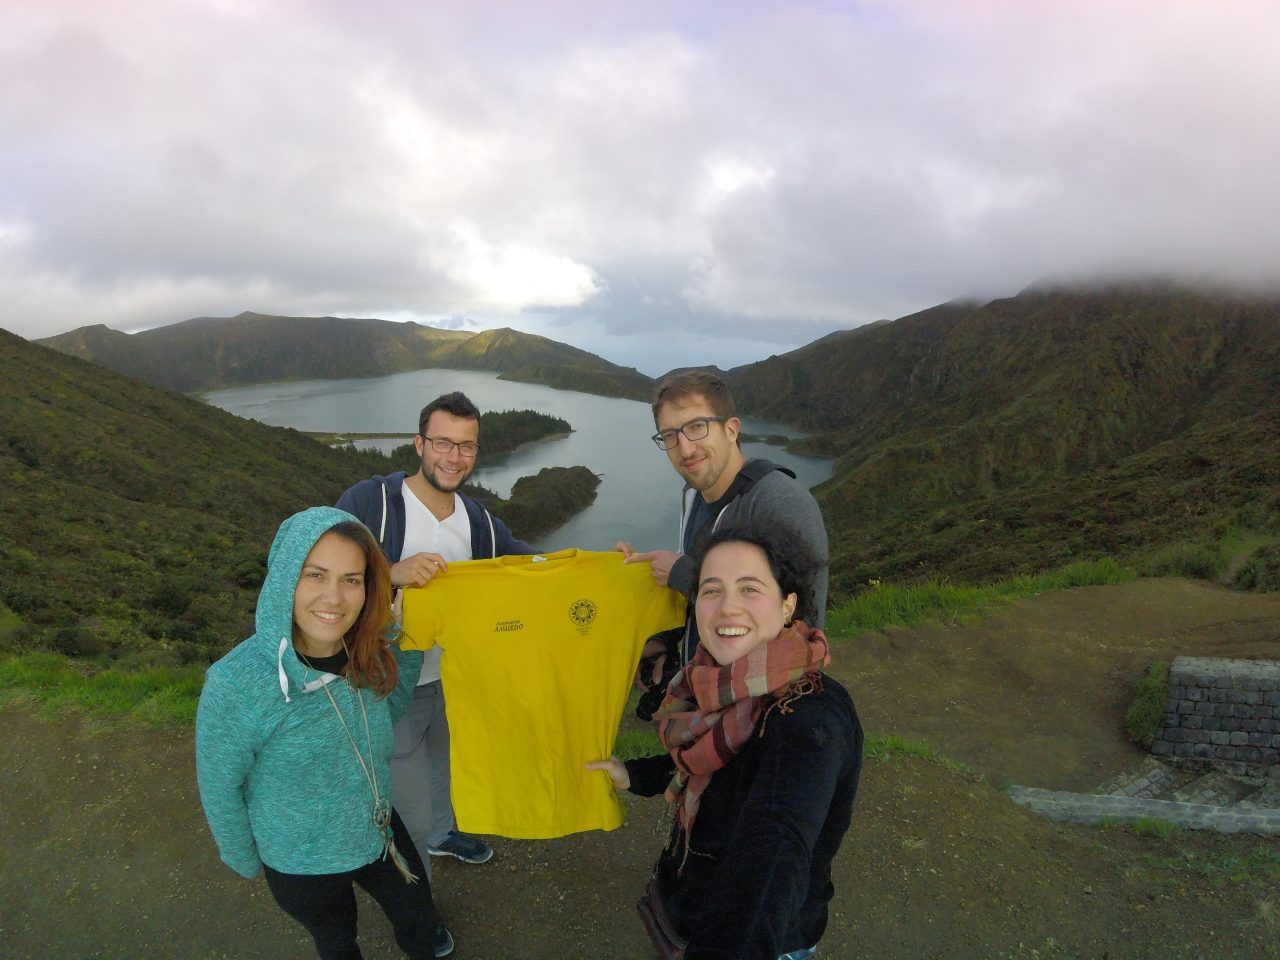 Lagoa-do-Fogo-San-Miguel-Azores-1280x960.jpg